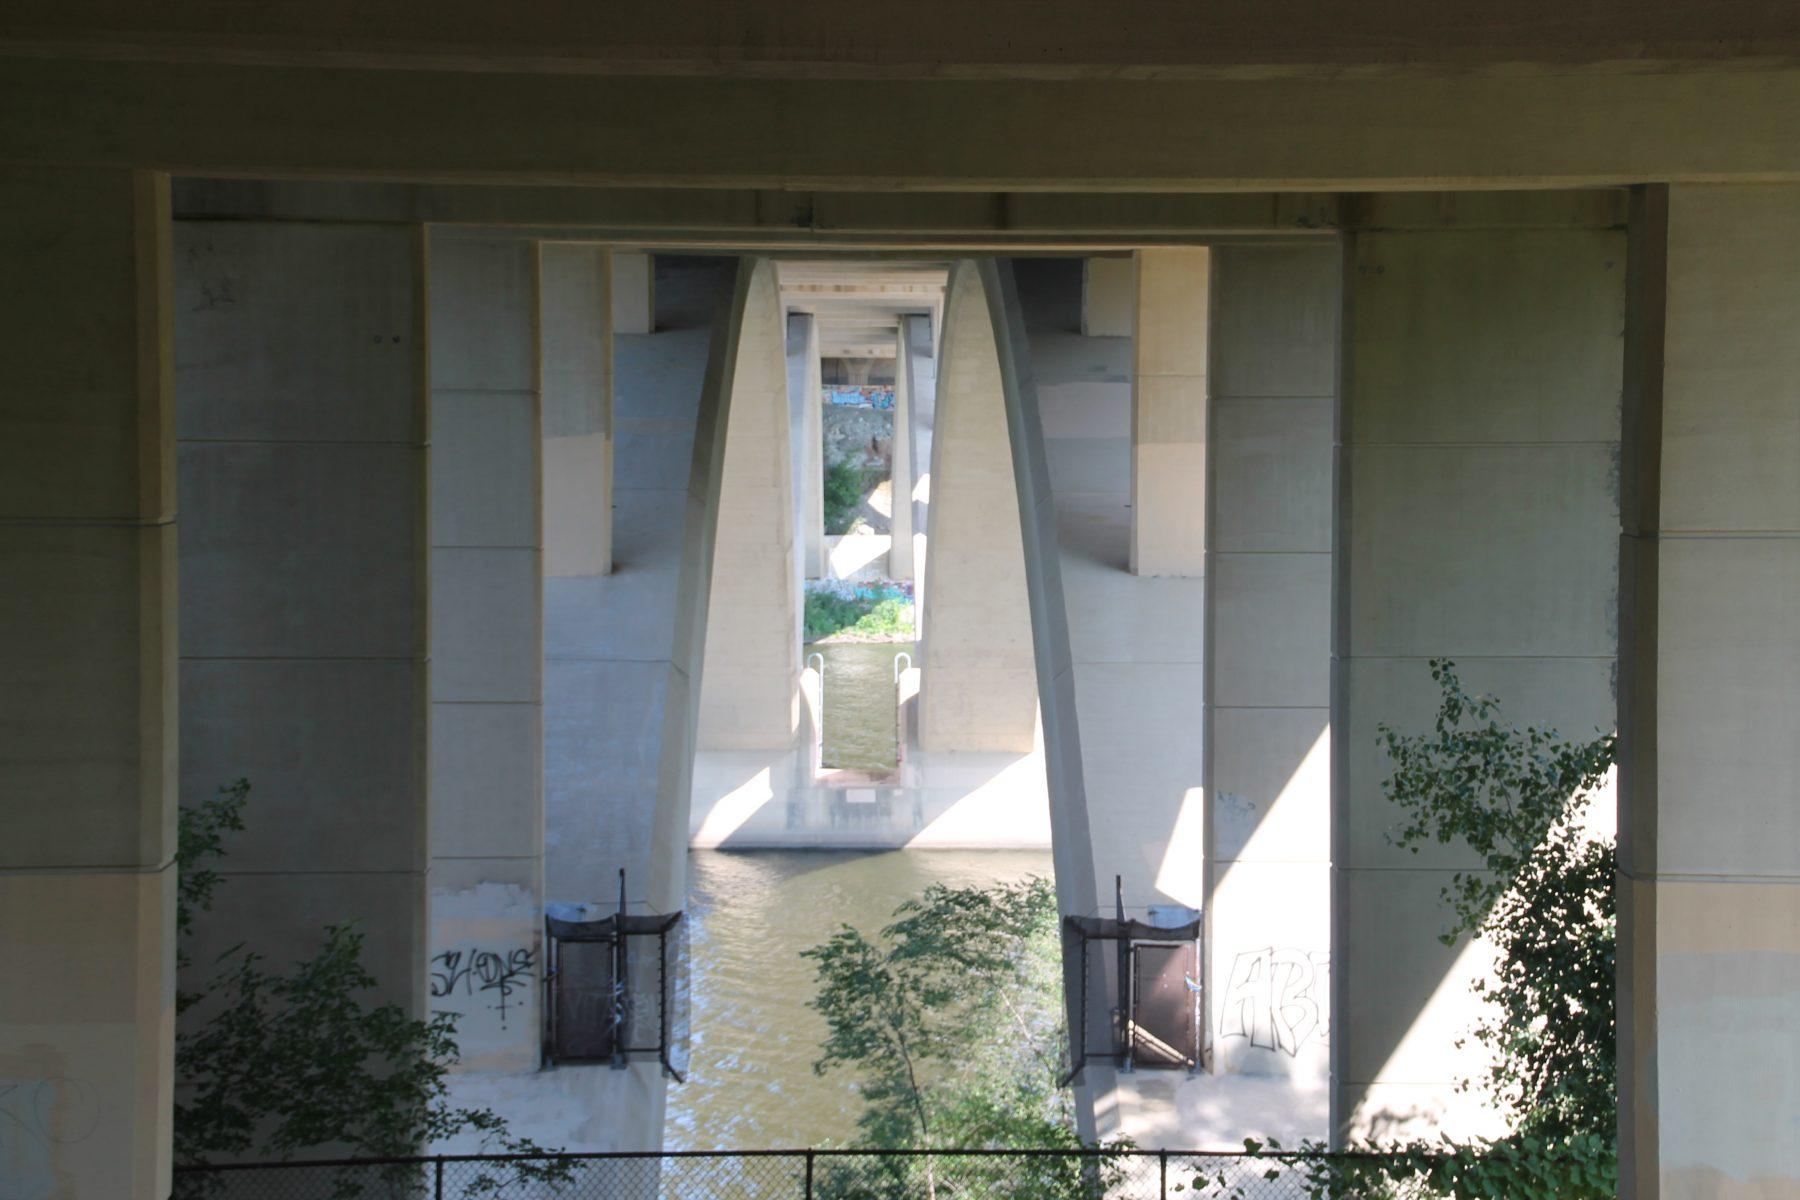 Support structures beneath Lake Street Bridge